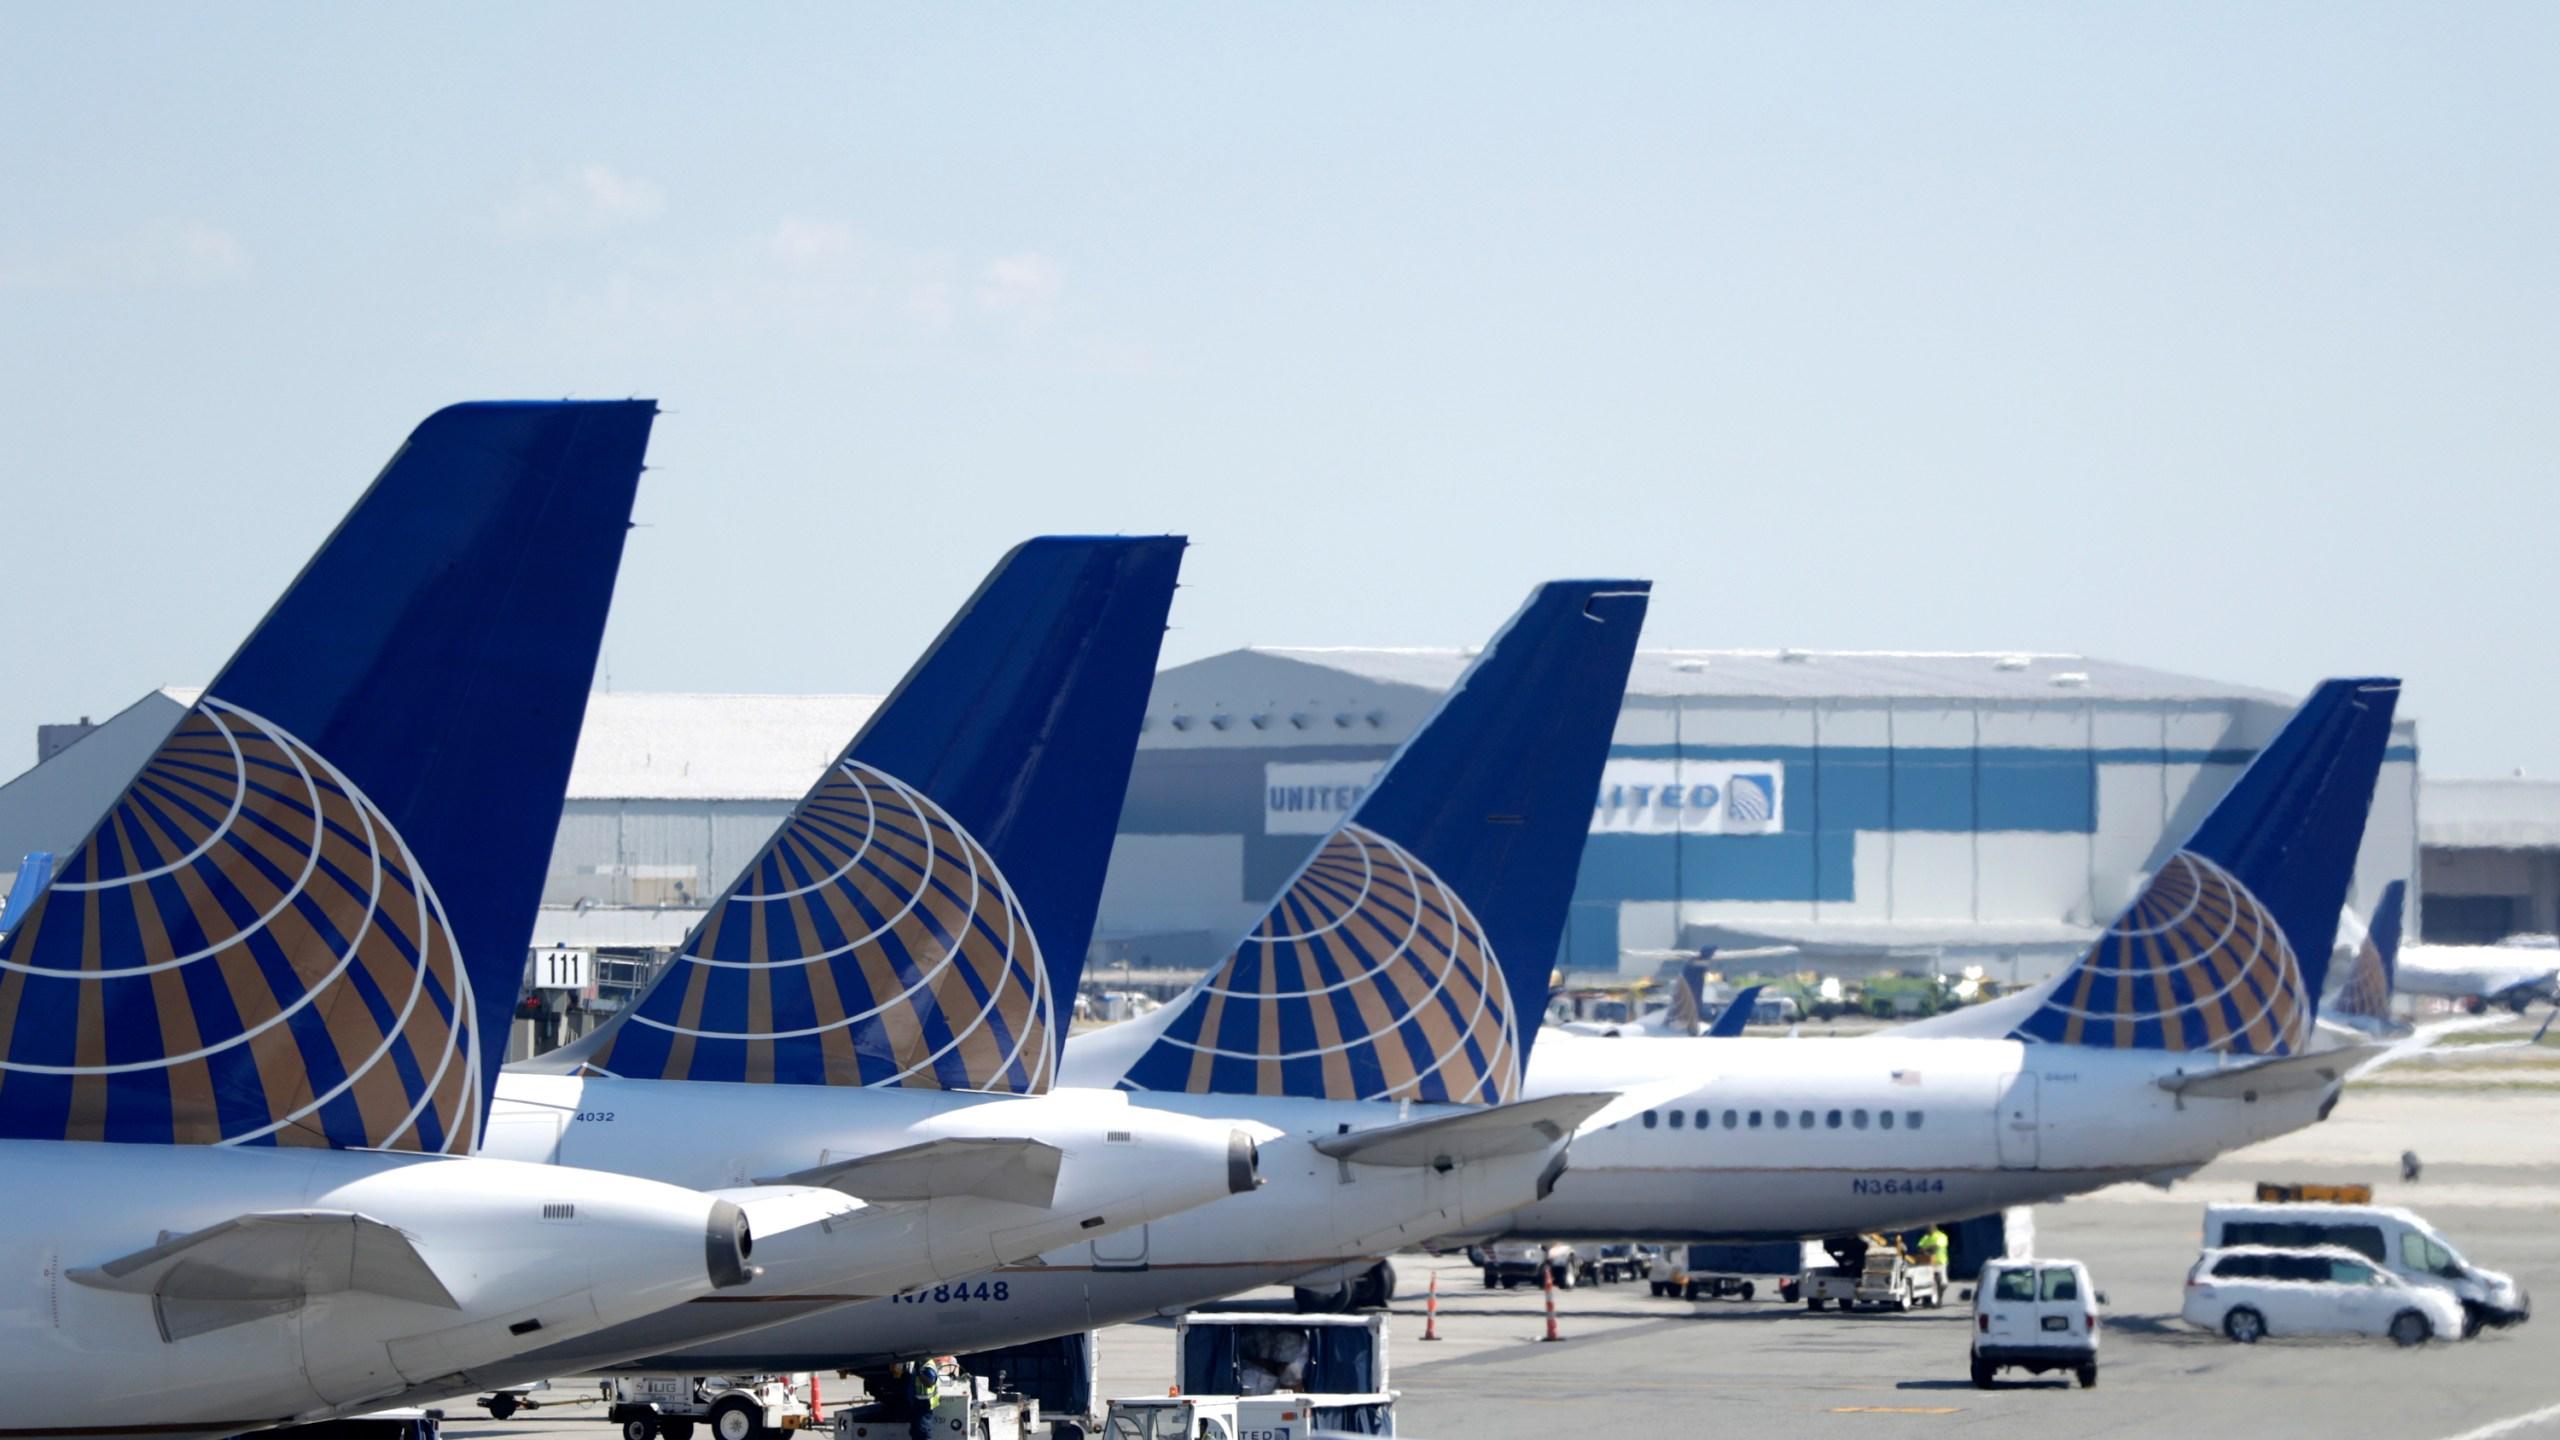 United_Airlines_Boeing_Max_24674-159532.jpg09778312